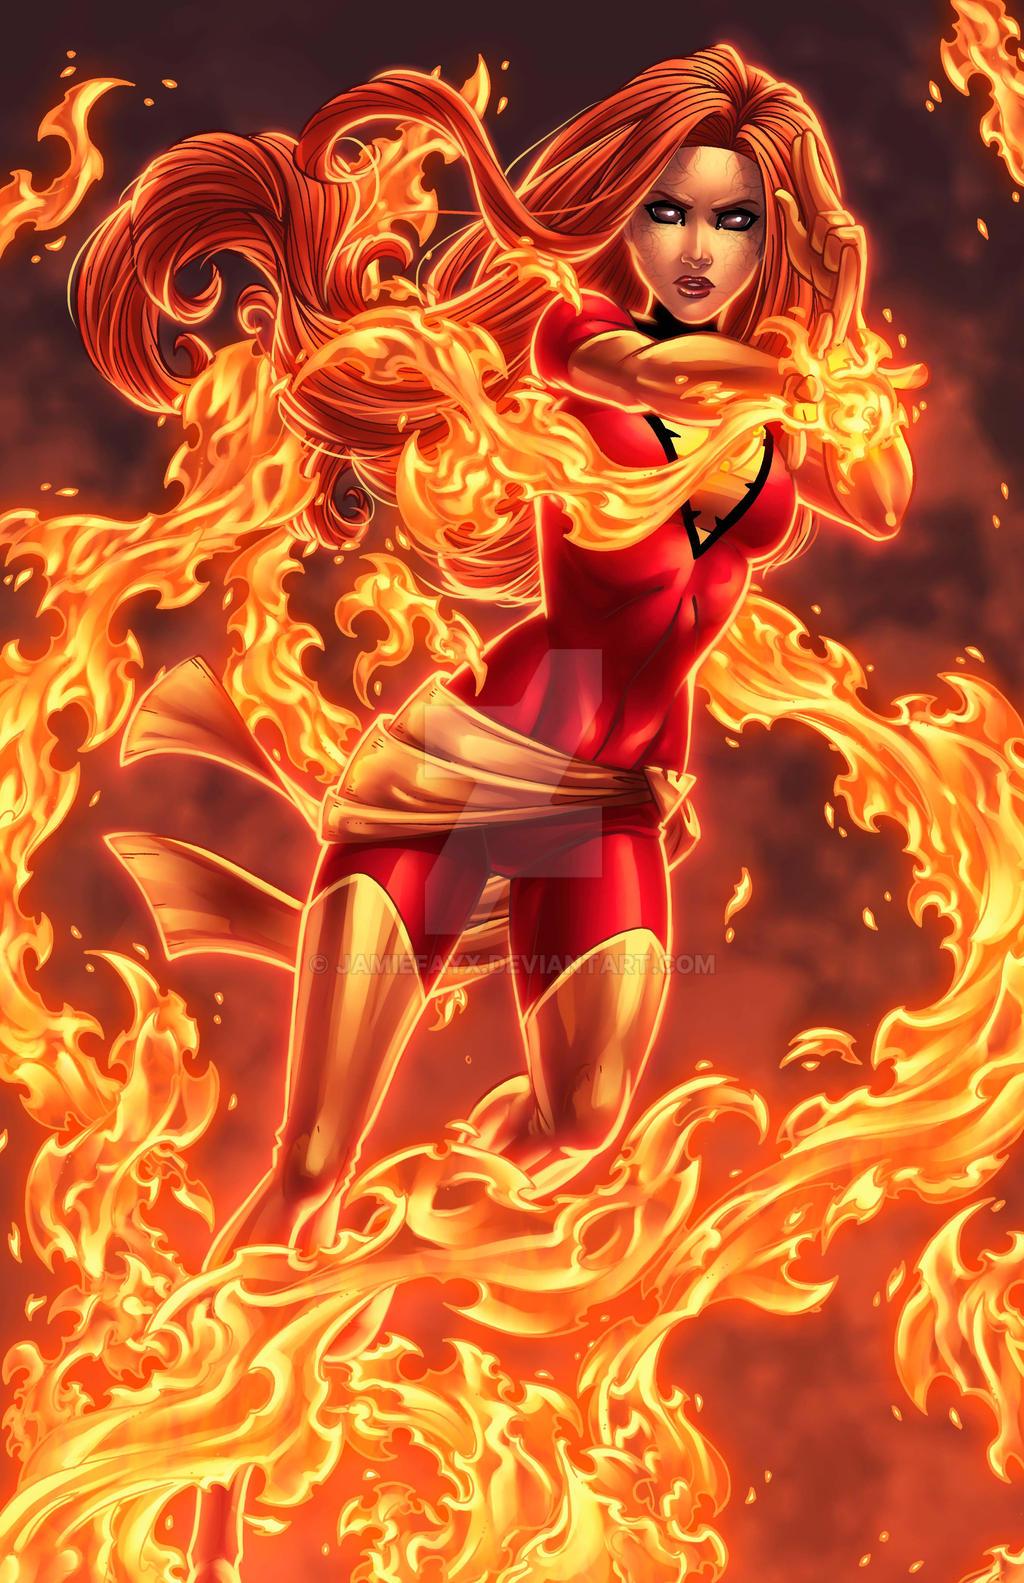 Dark phoenix rising by jamiefayx on deviantart - Jean grey phoenix wallpaper ...